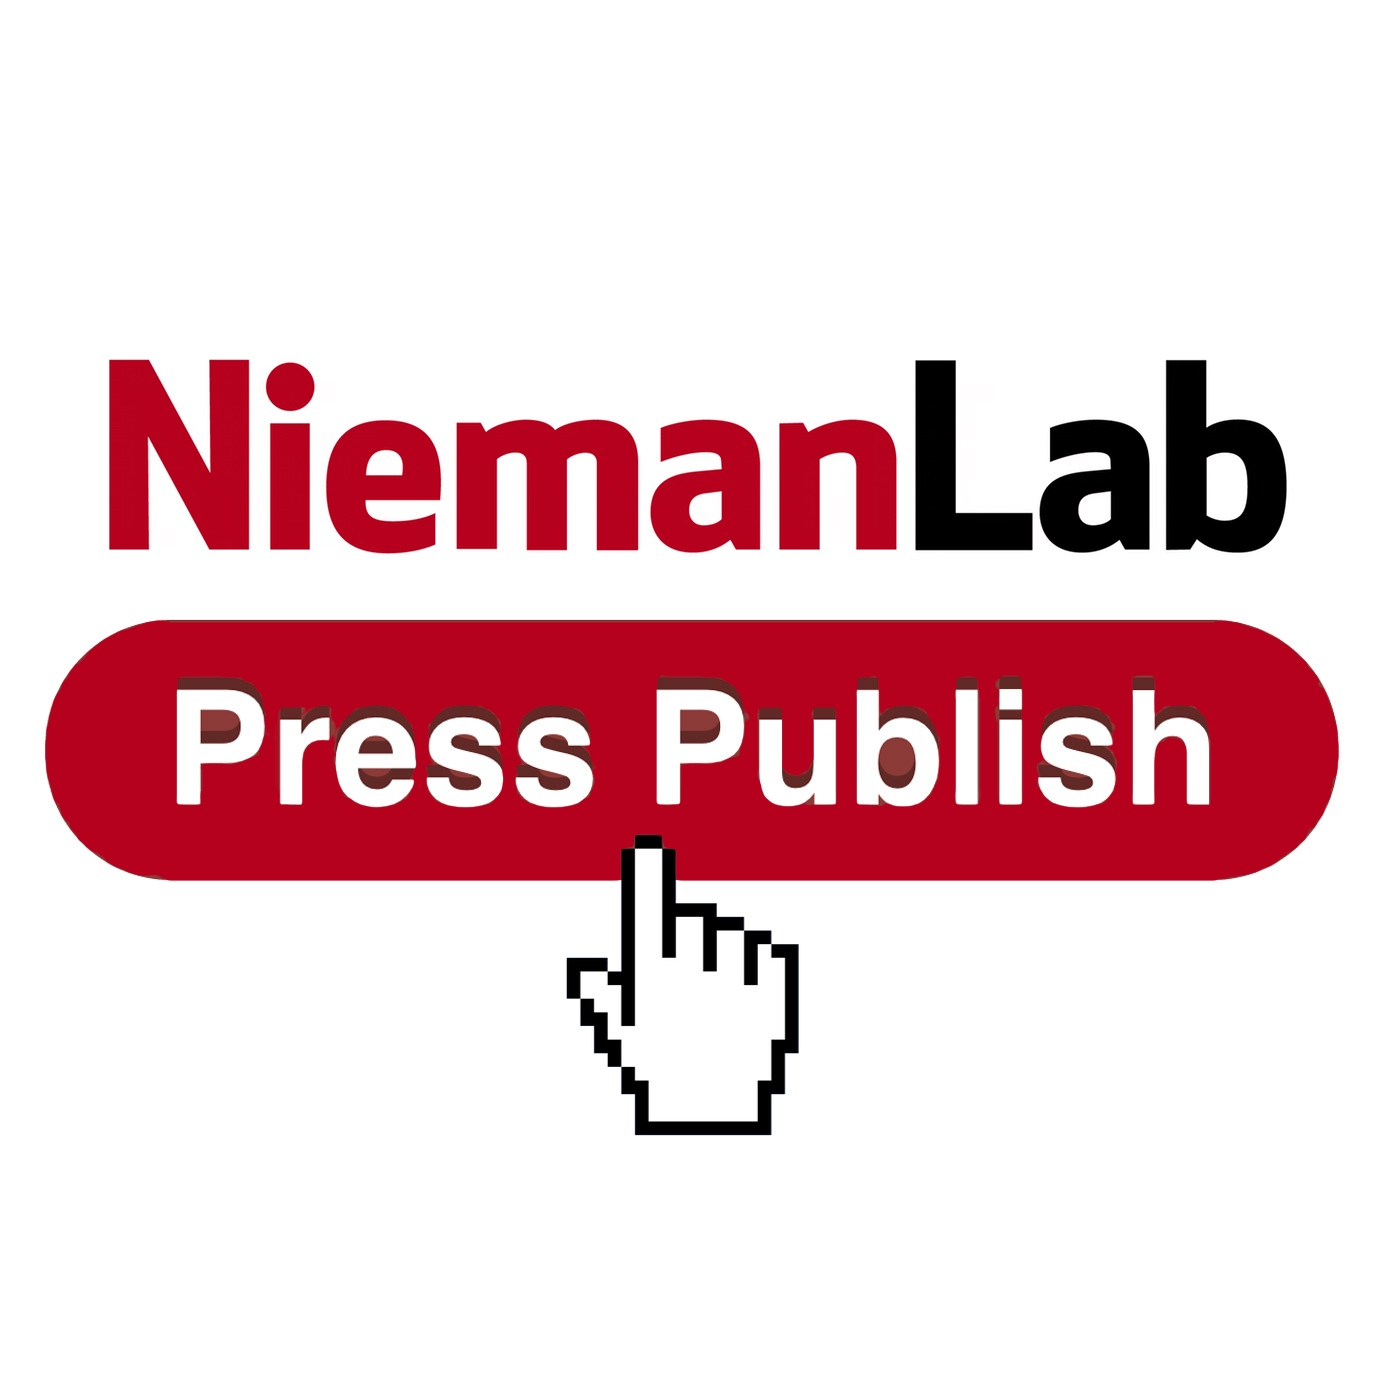 press-publish-2-1400px